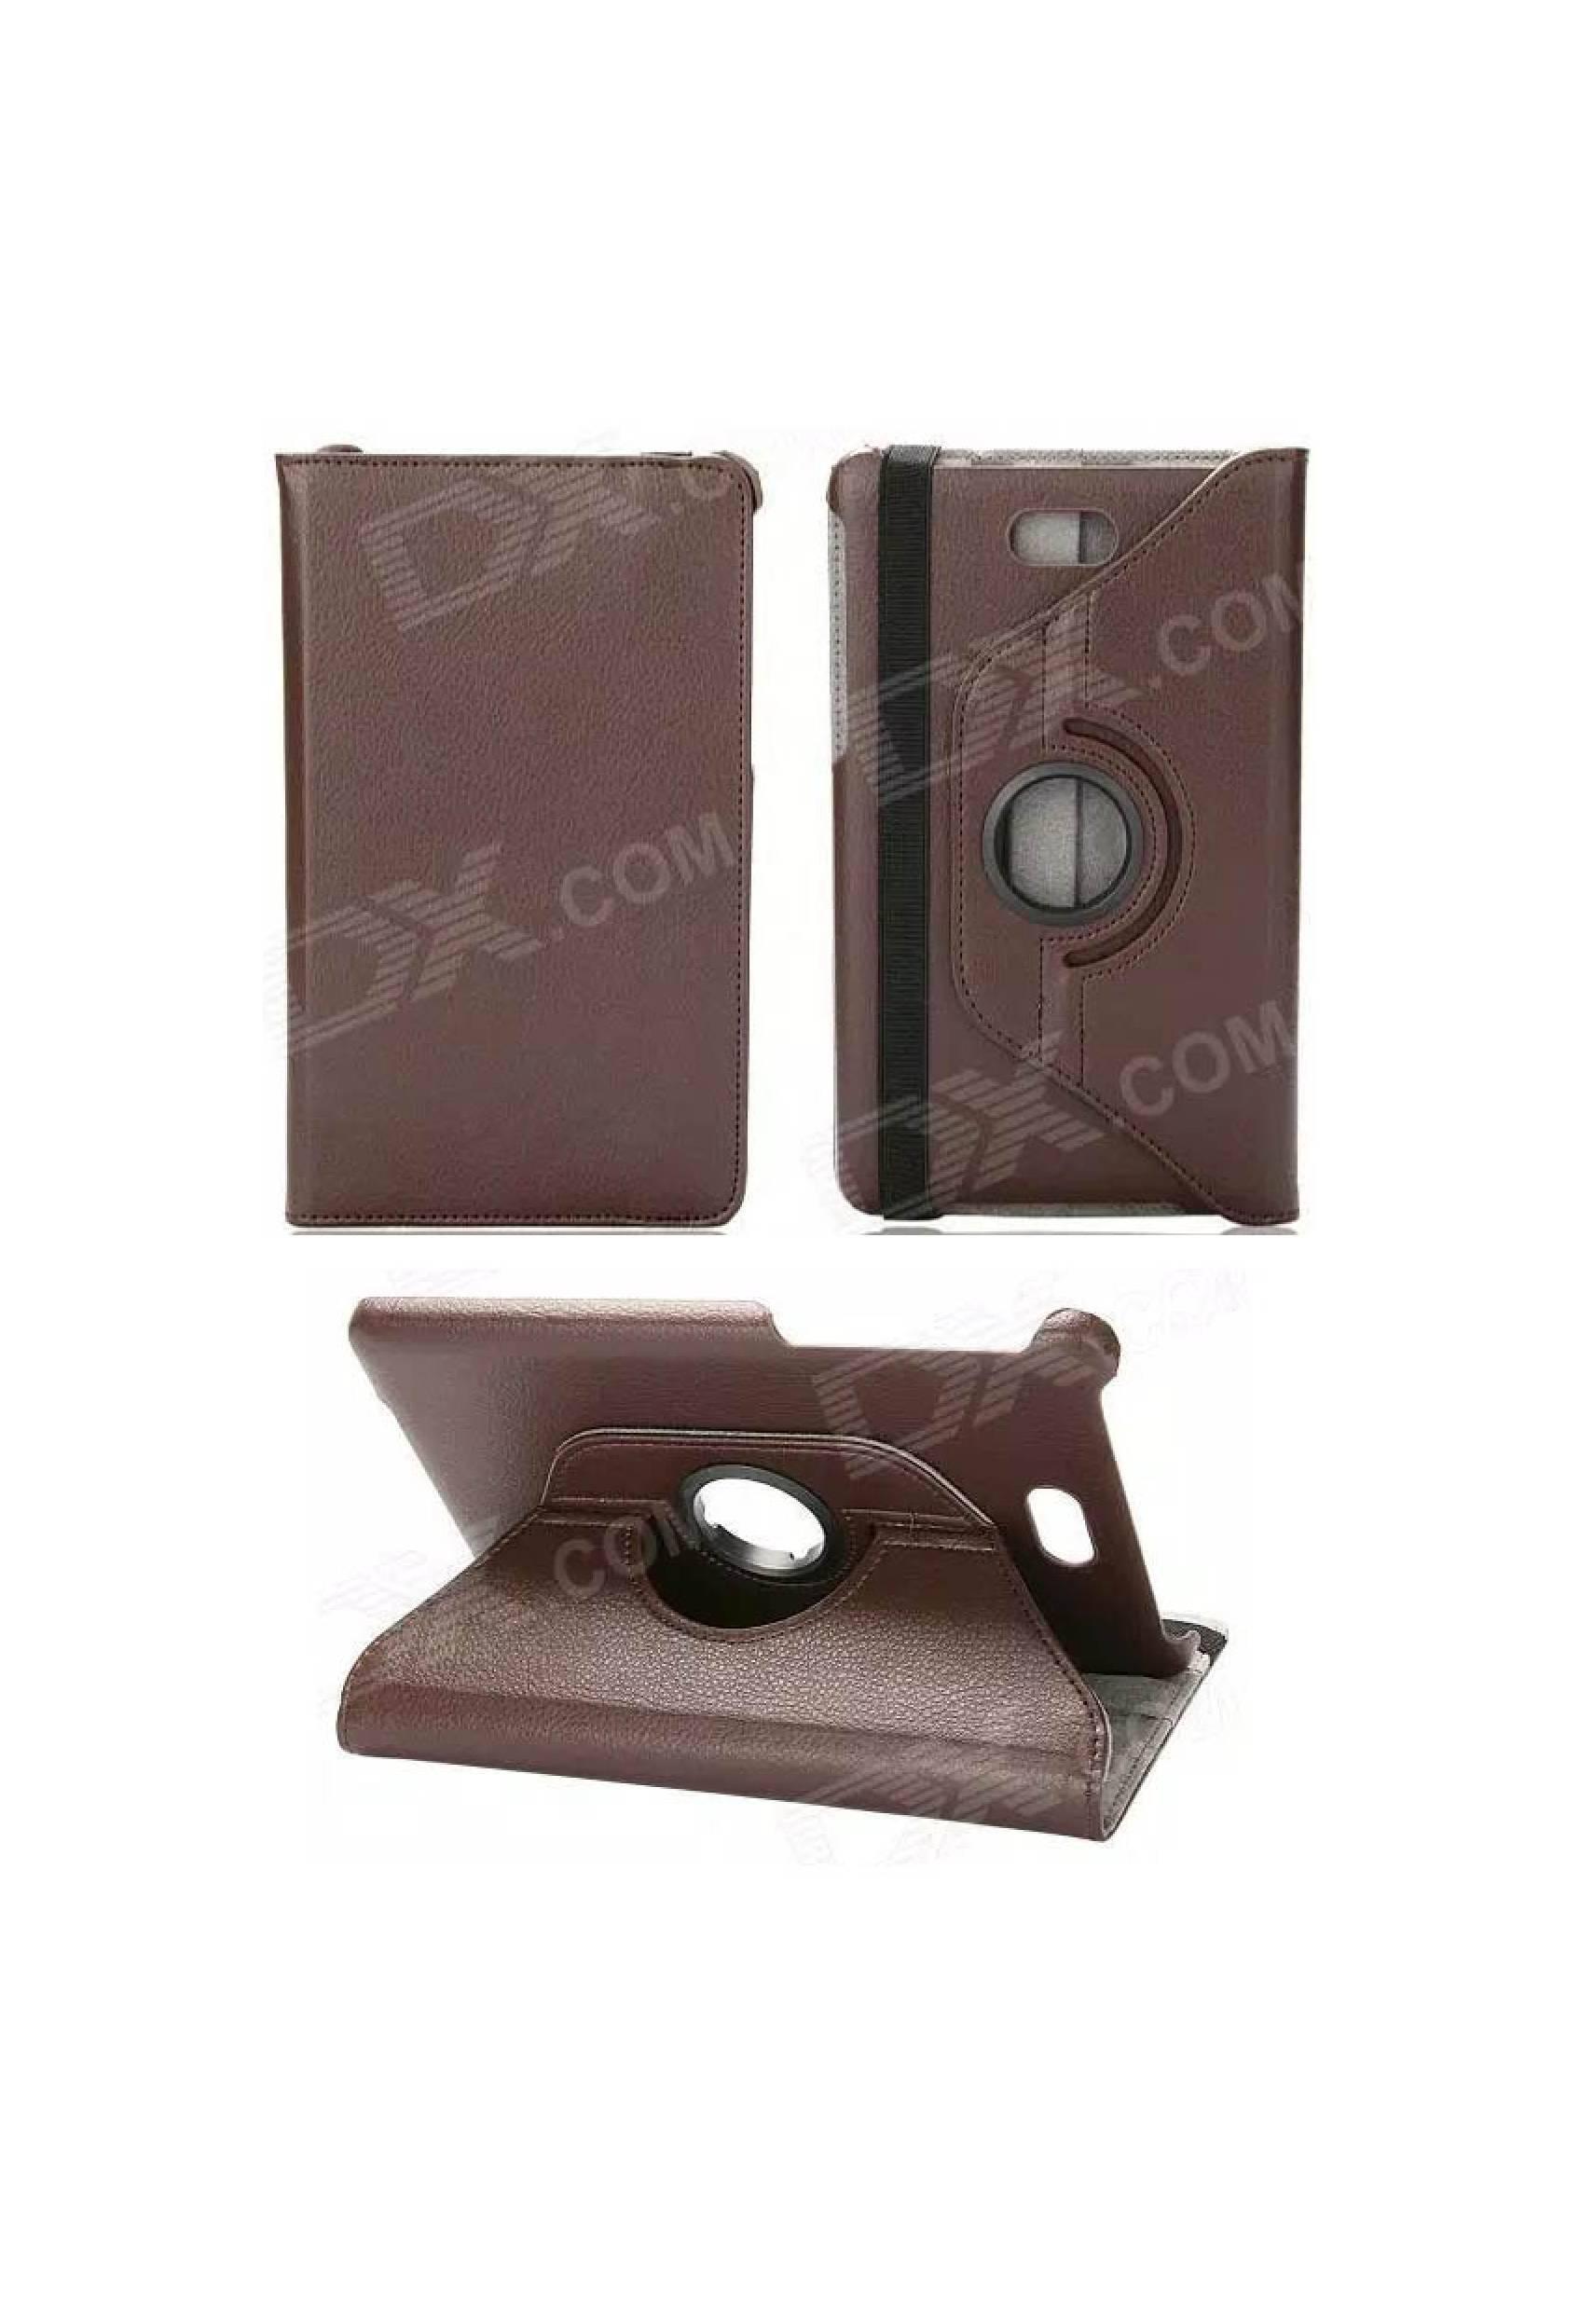 Leather Case Dell Venue 8 Pro - HTC Flyer (free antigores stylus pen)